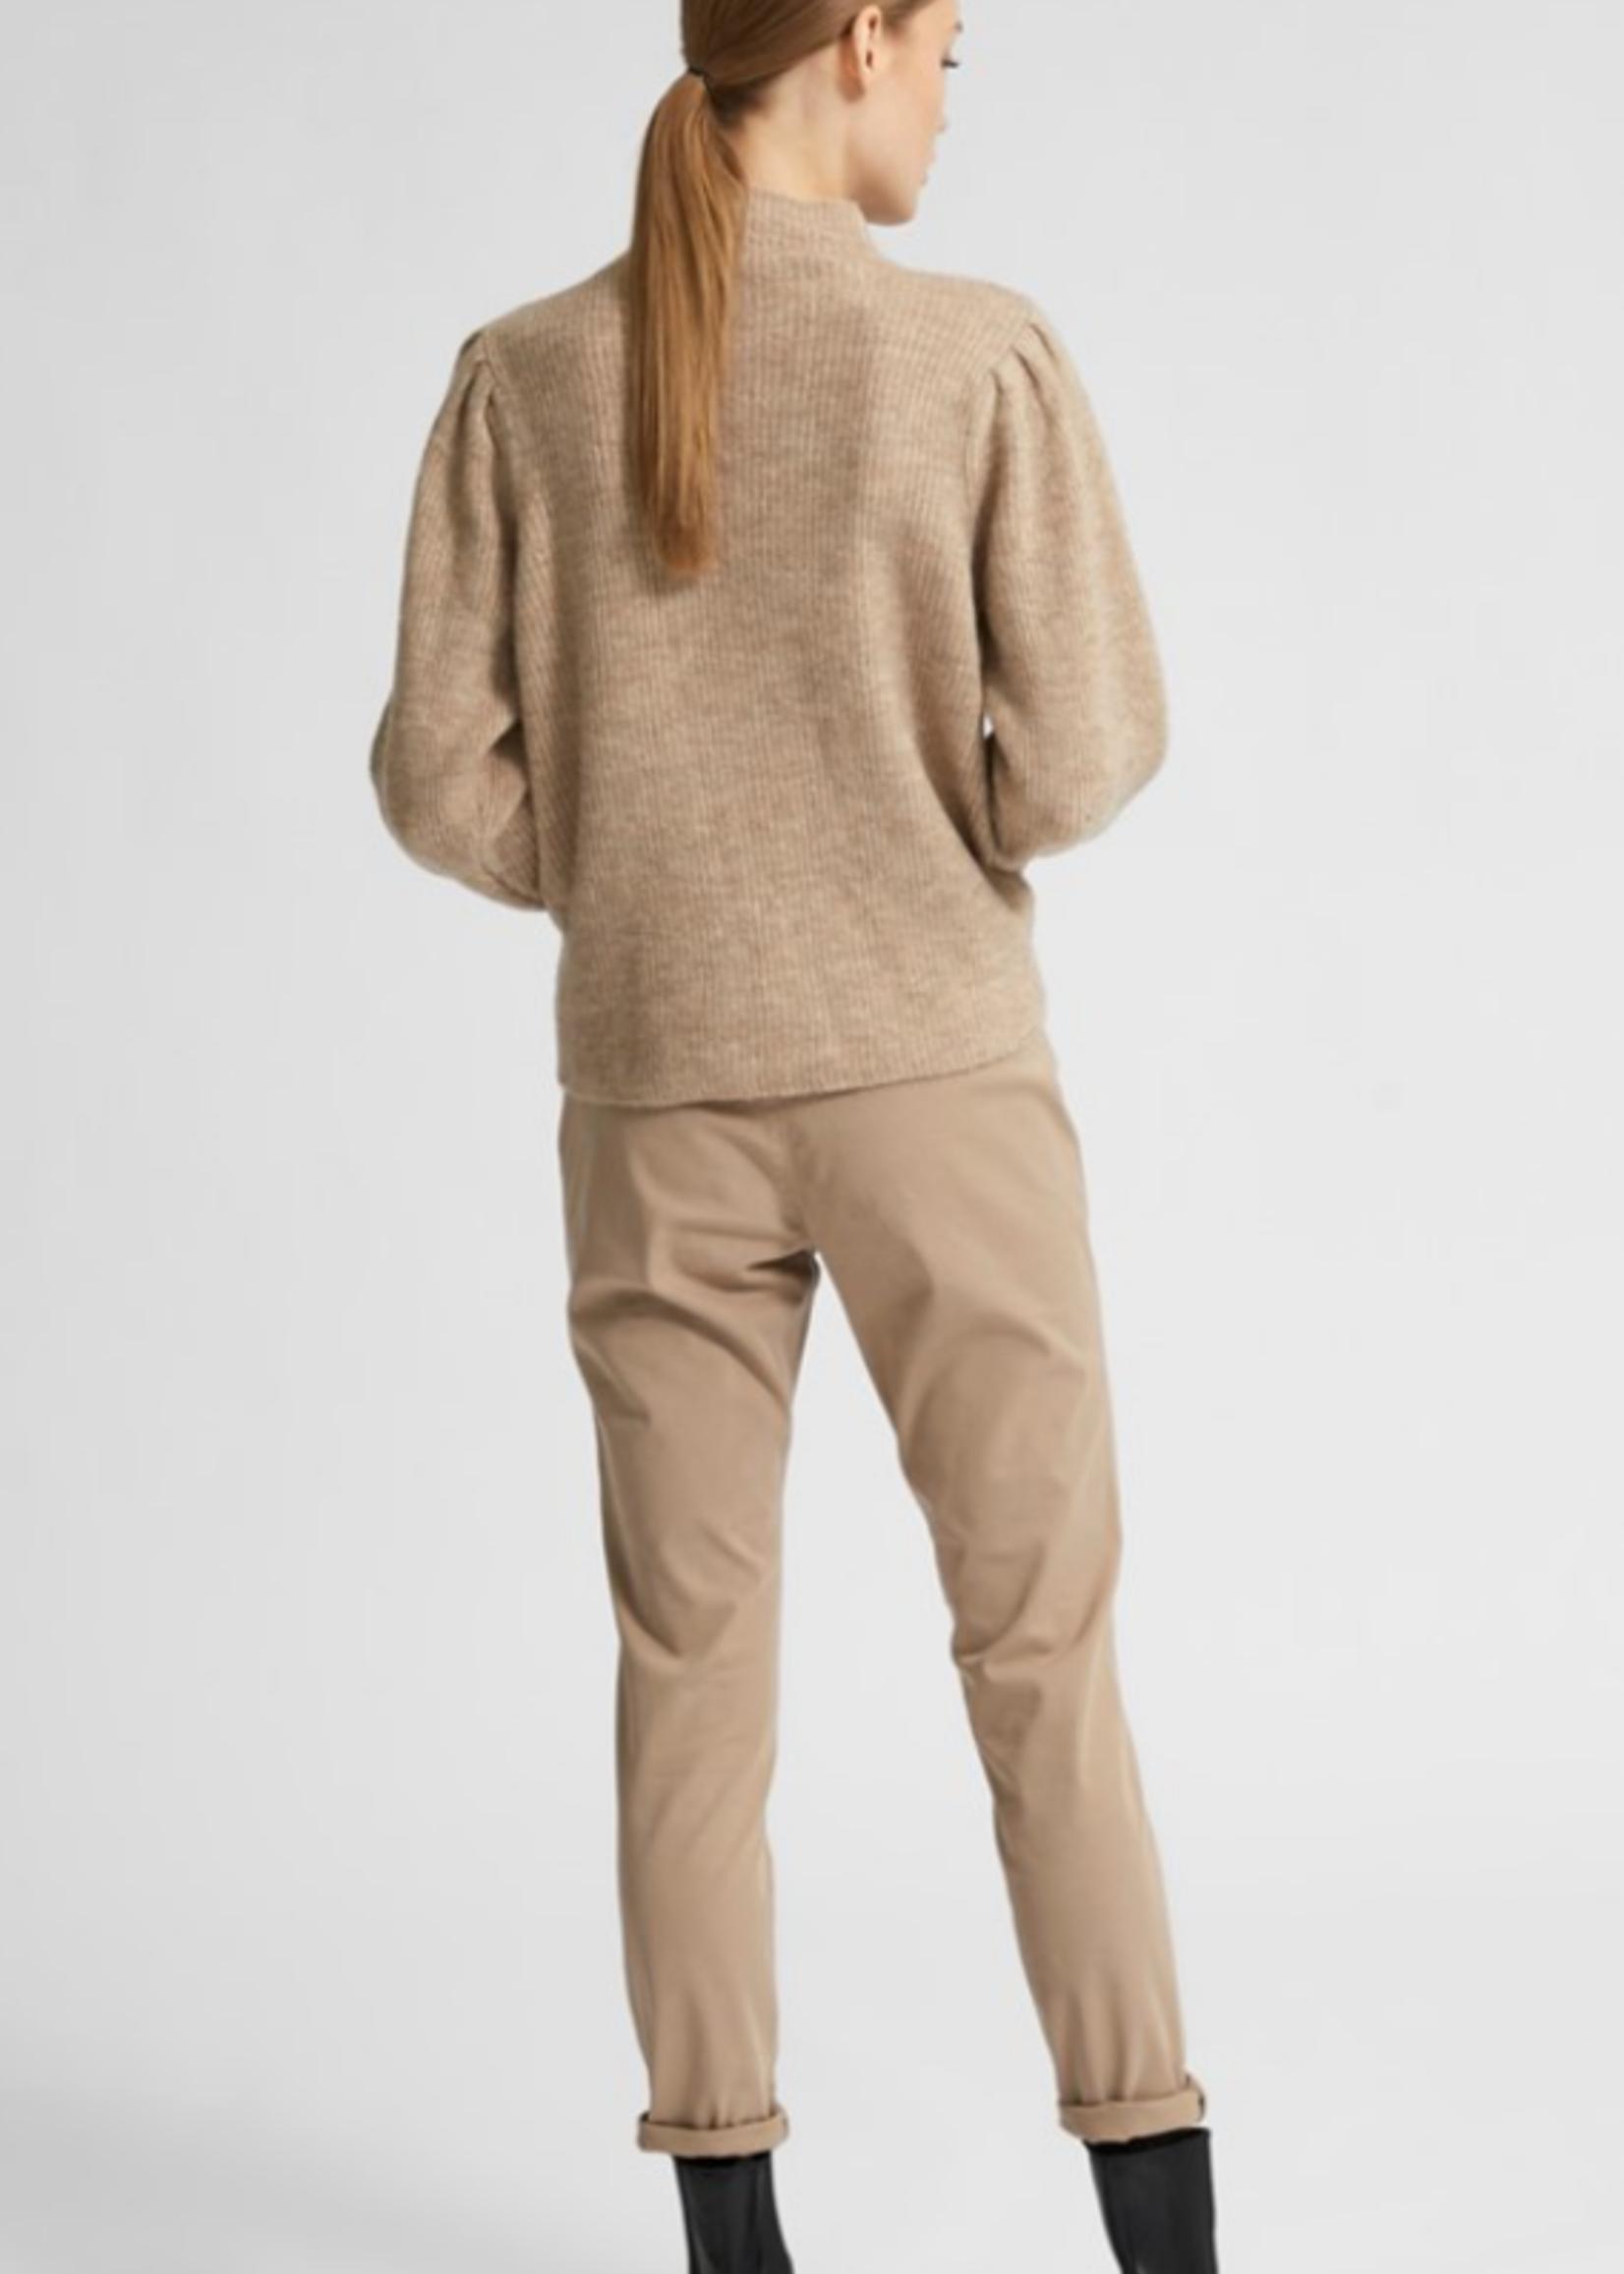 Selected Femme Lipa knit t-neck